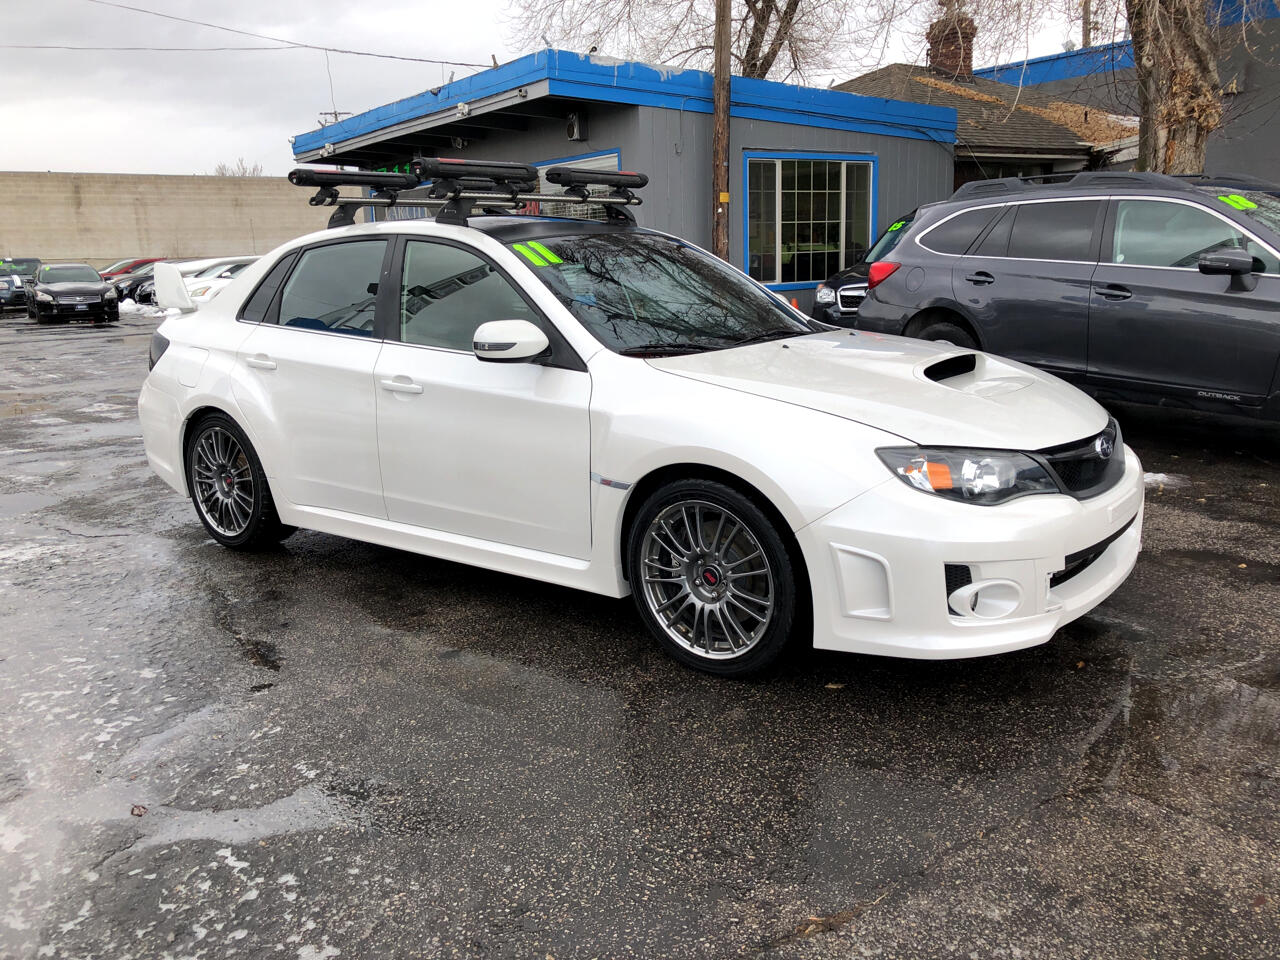 2011 Subaru Impreza Sedan WRX 4dr Man WRX STI Limited